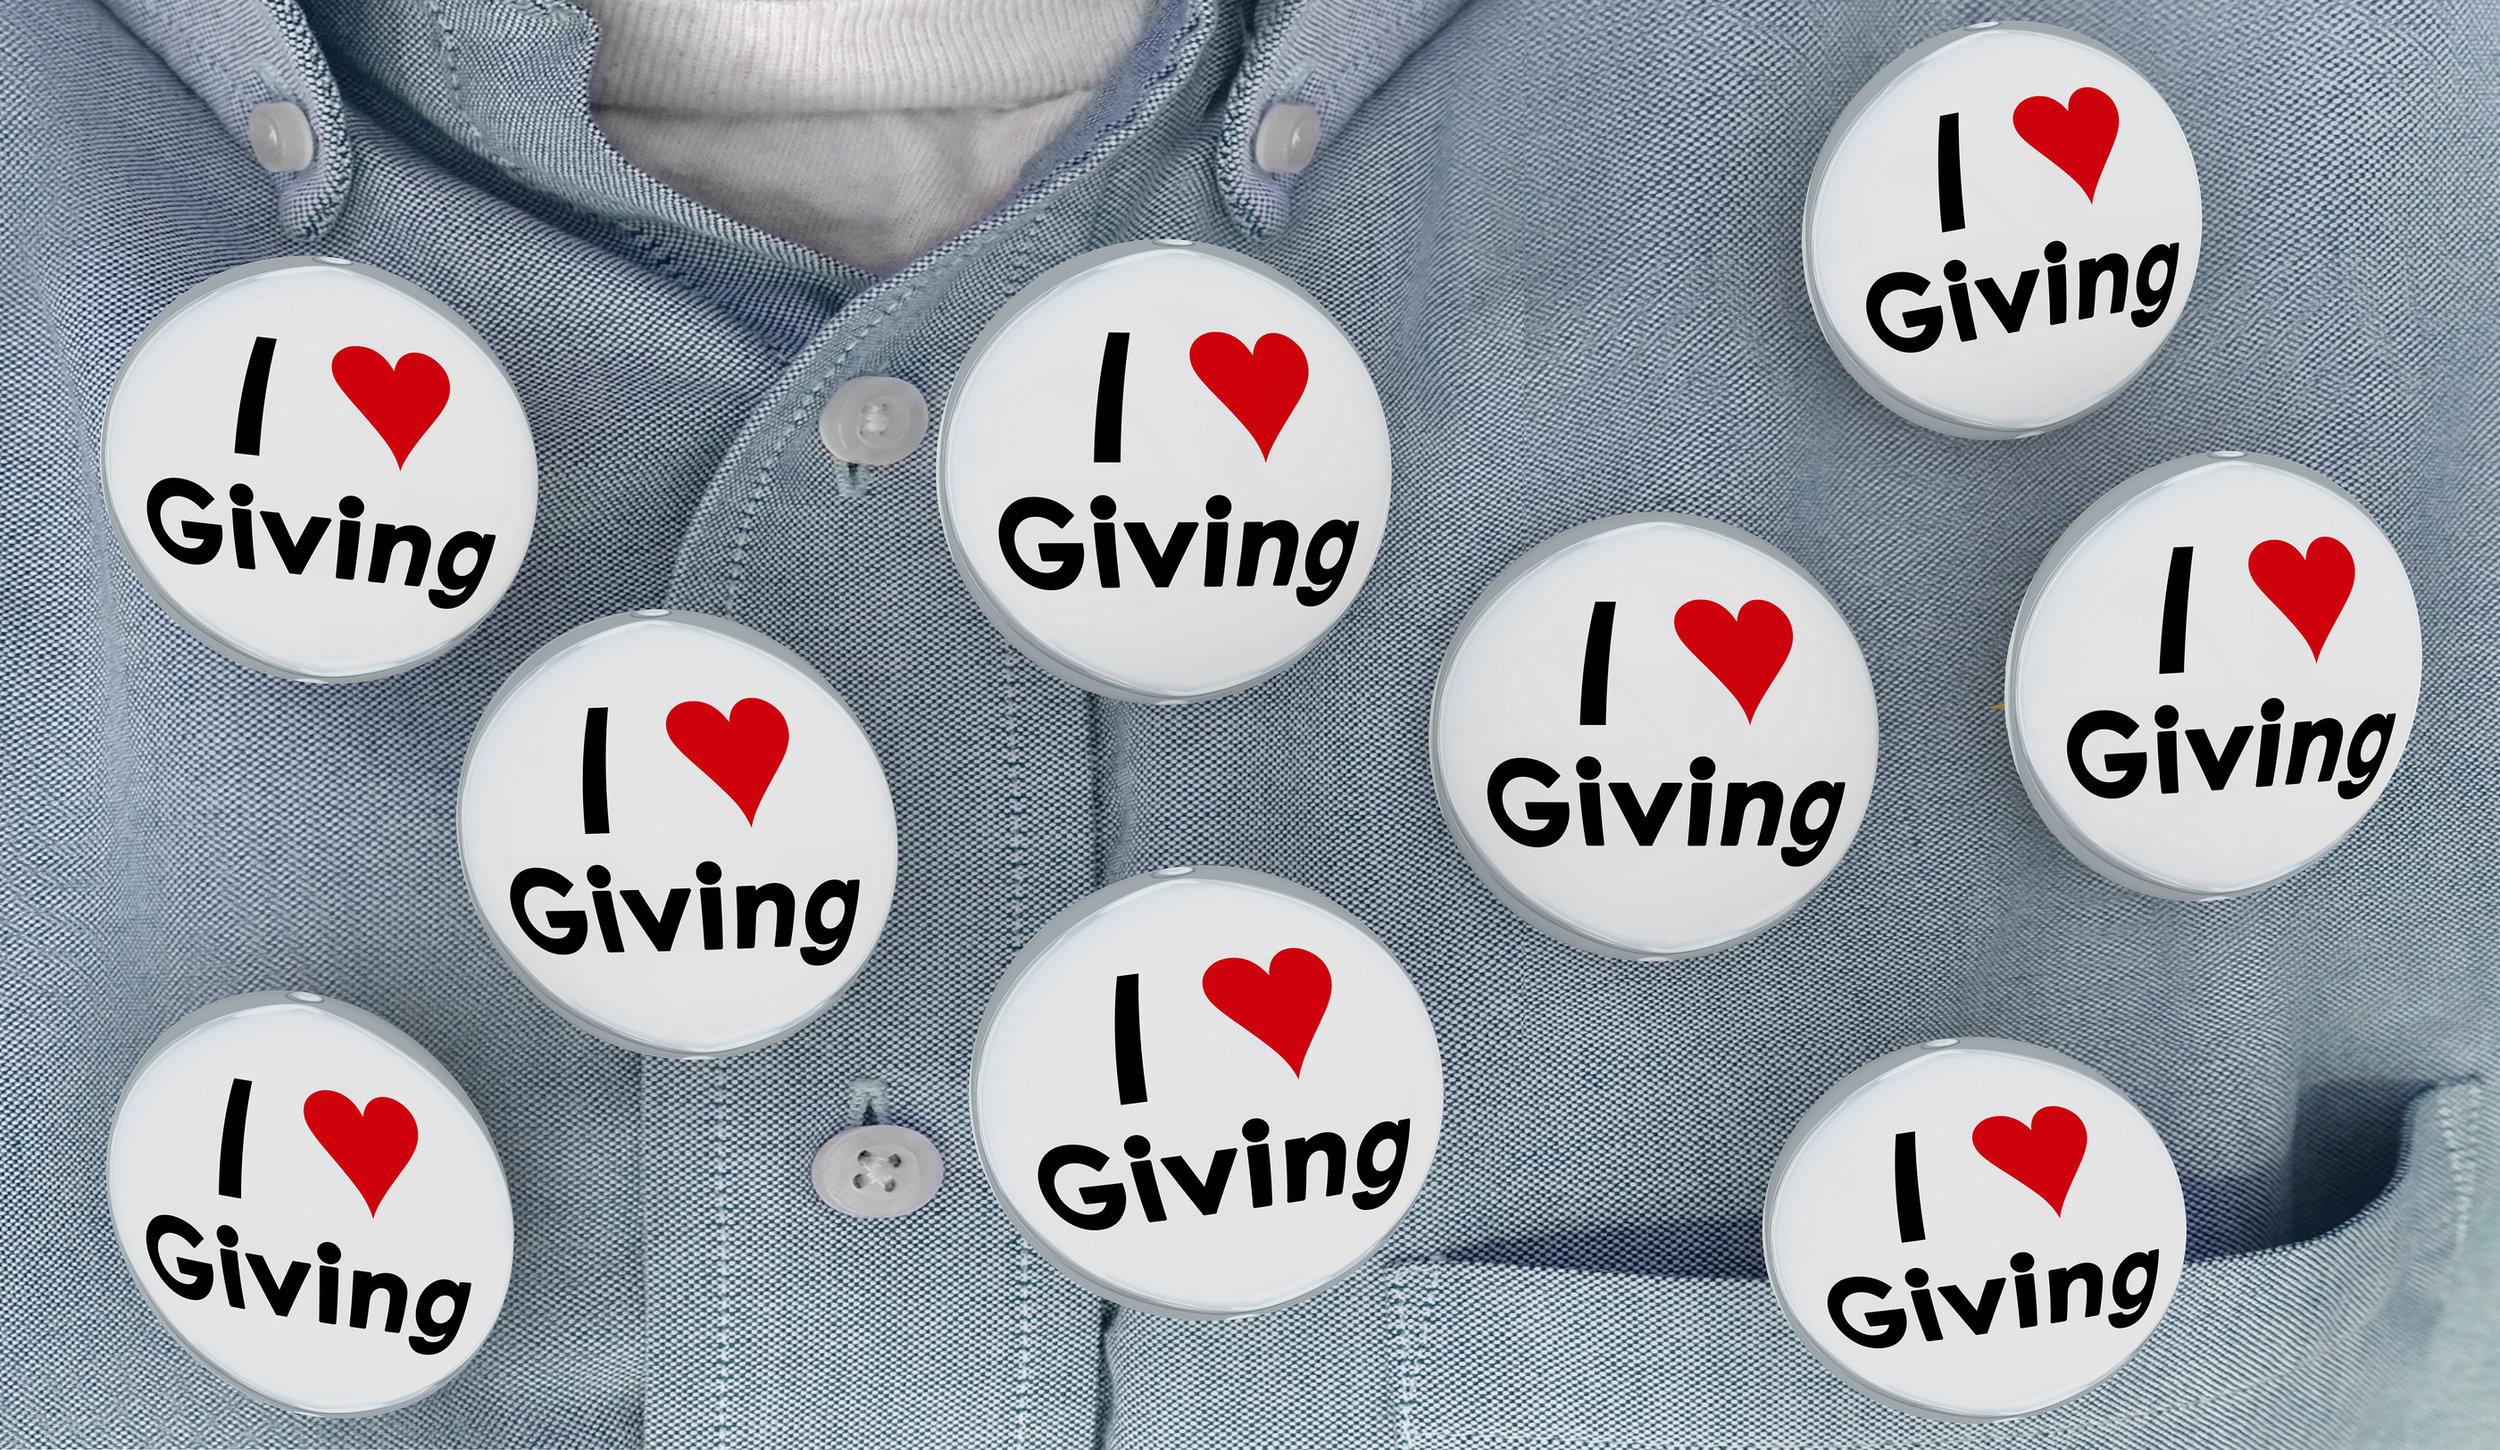 bigstock-I-Love-Giving-Charity-Helping--215850559.jpg